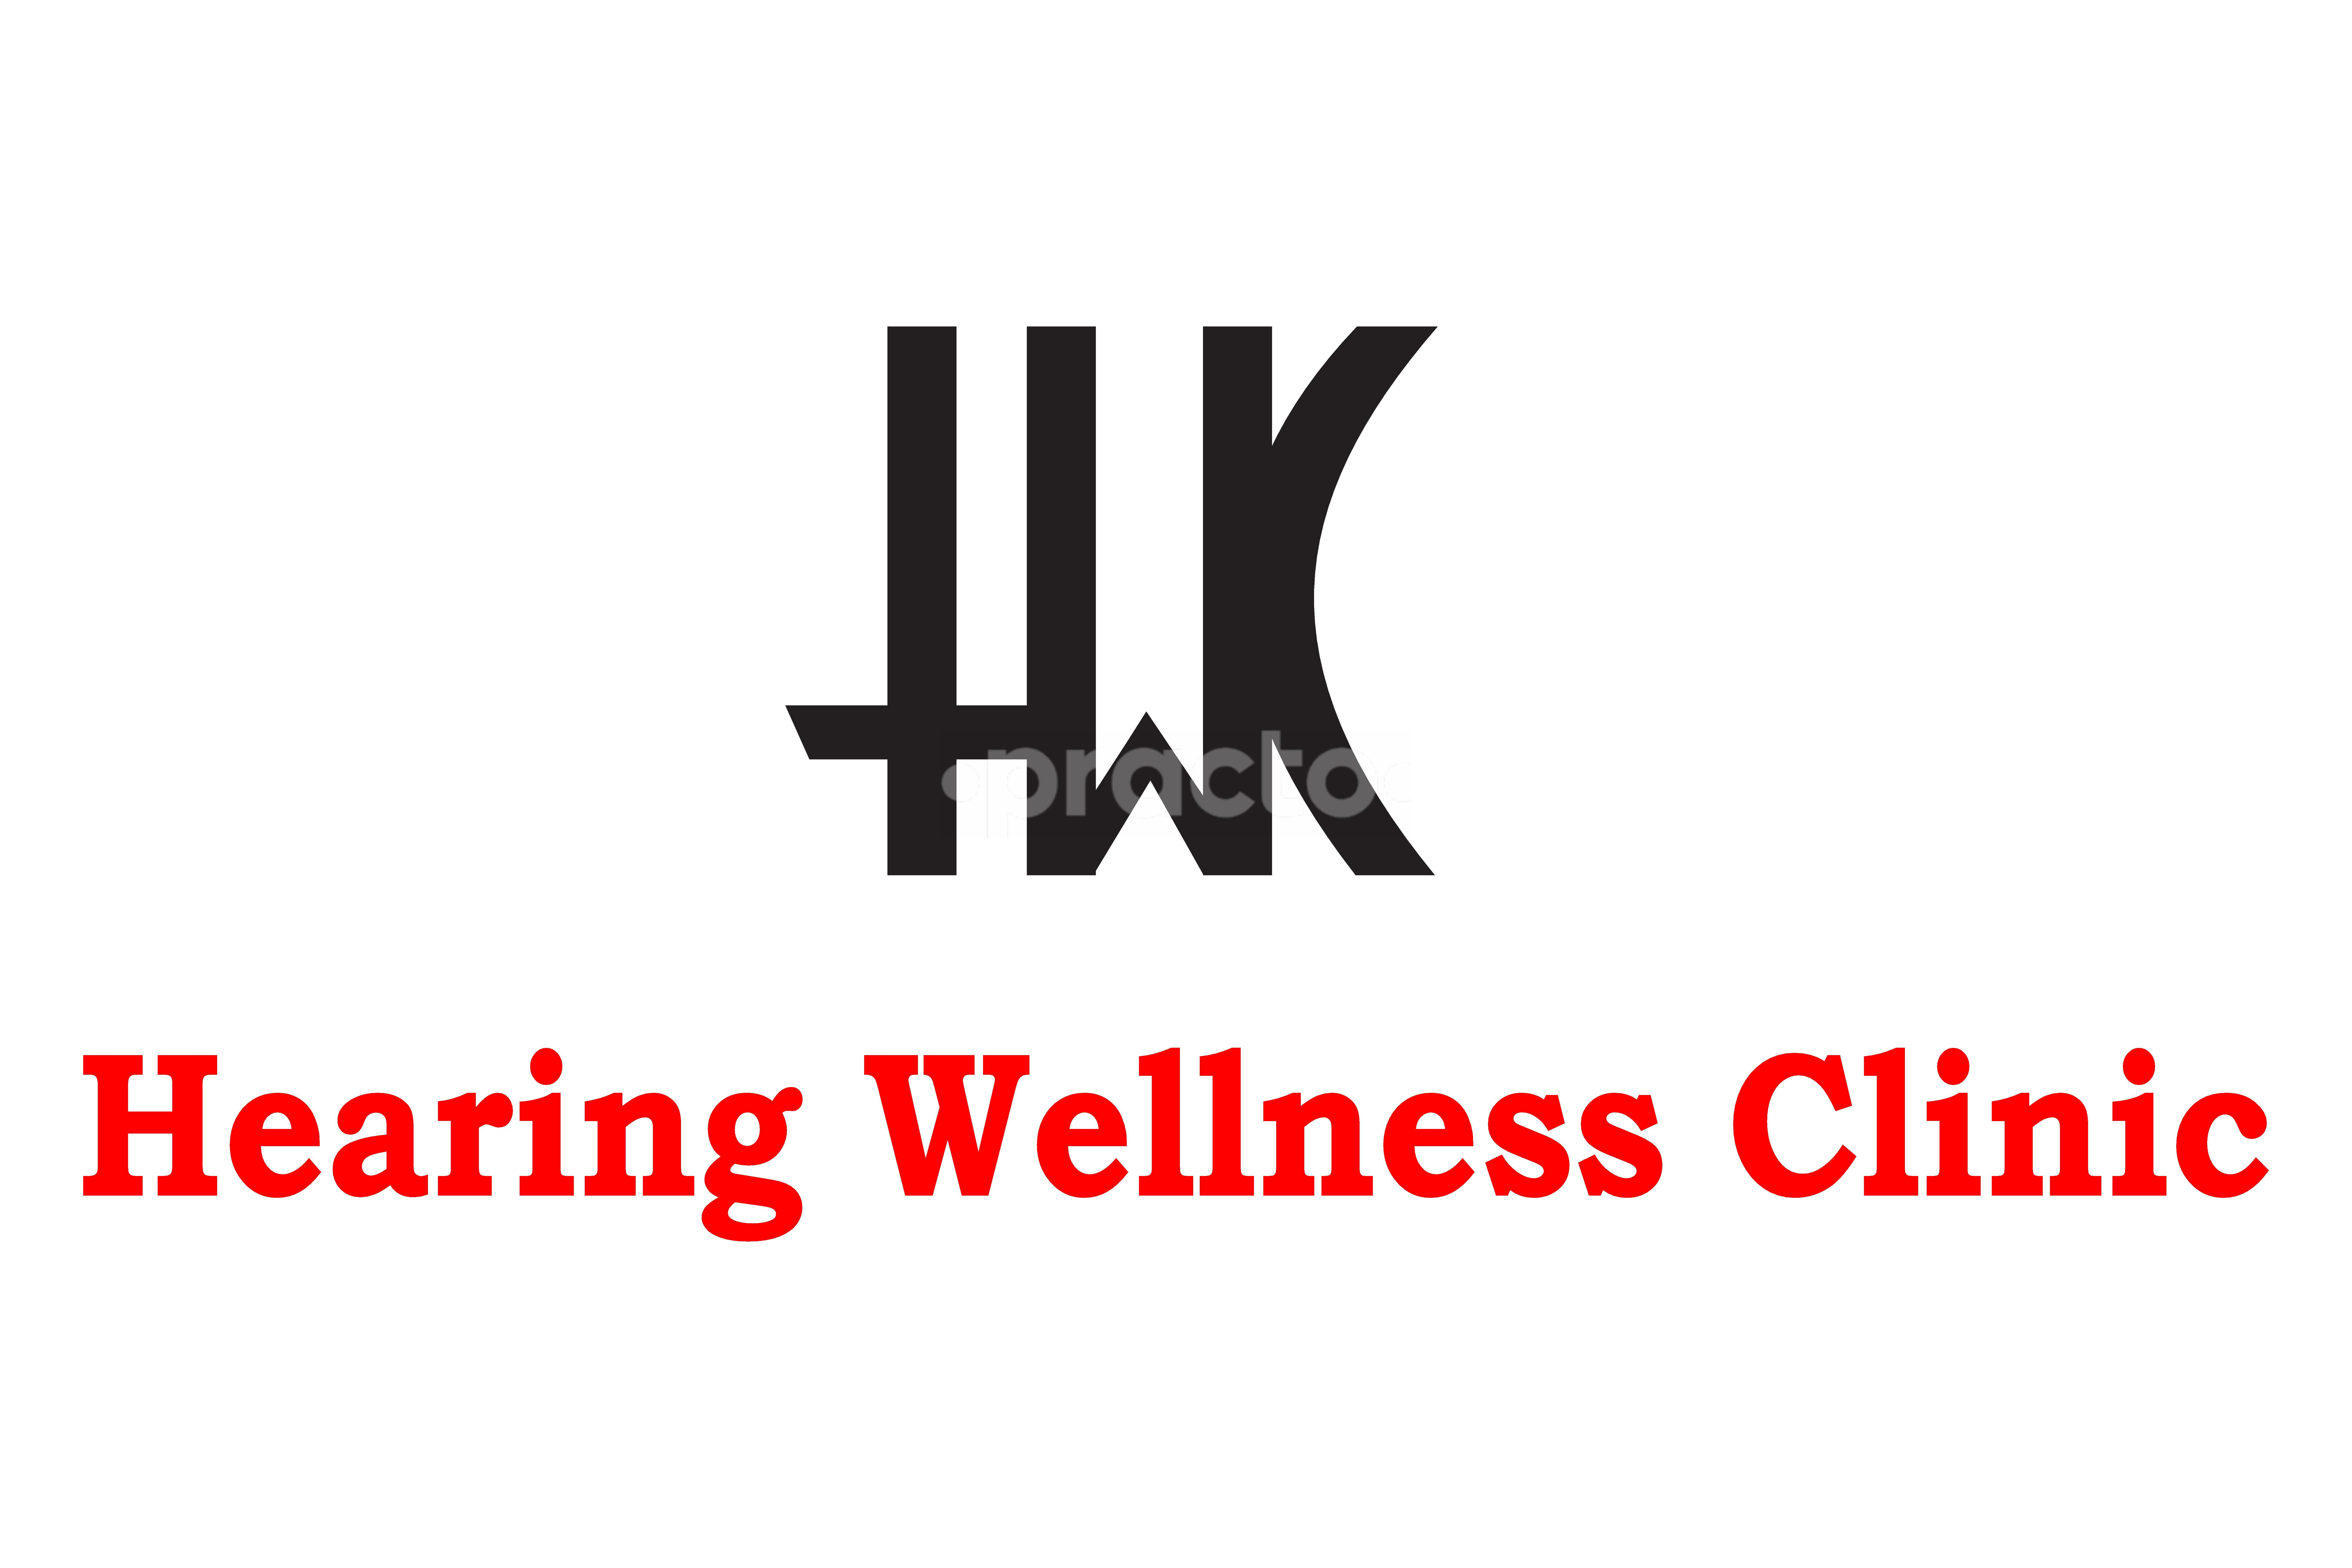 Hearing Wellness Clinic